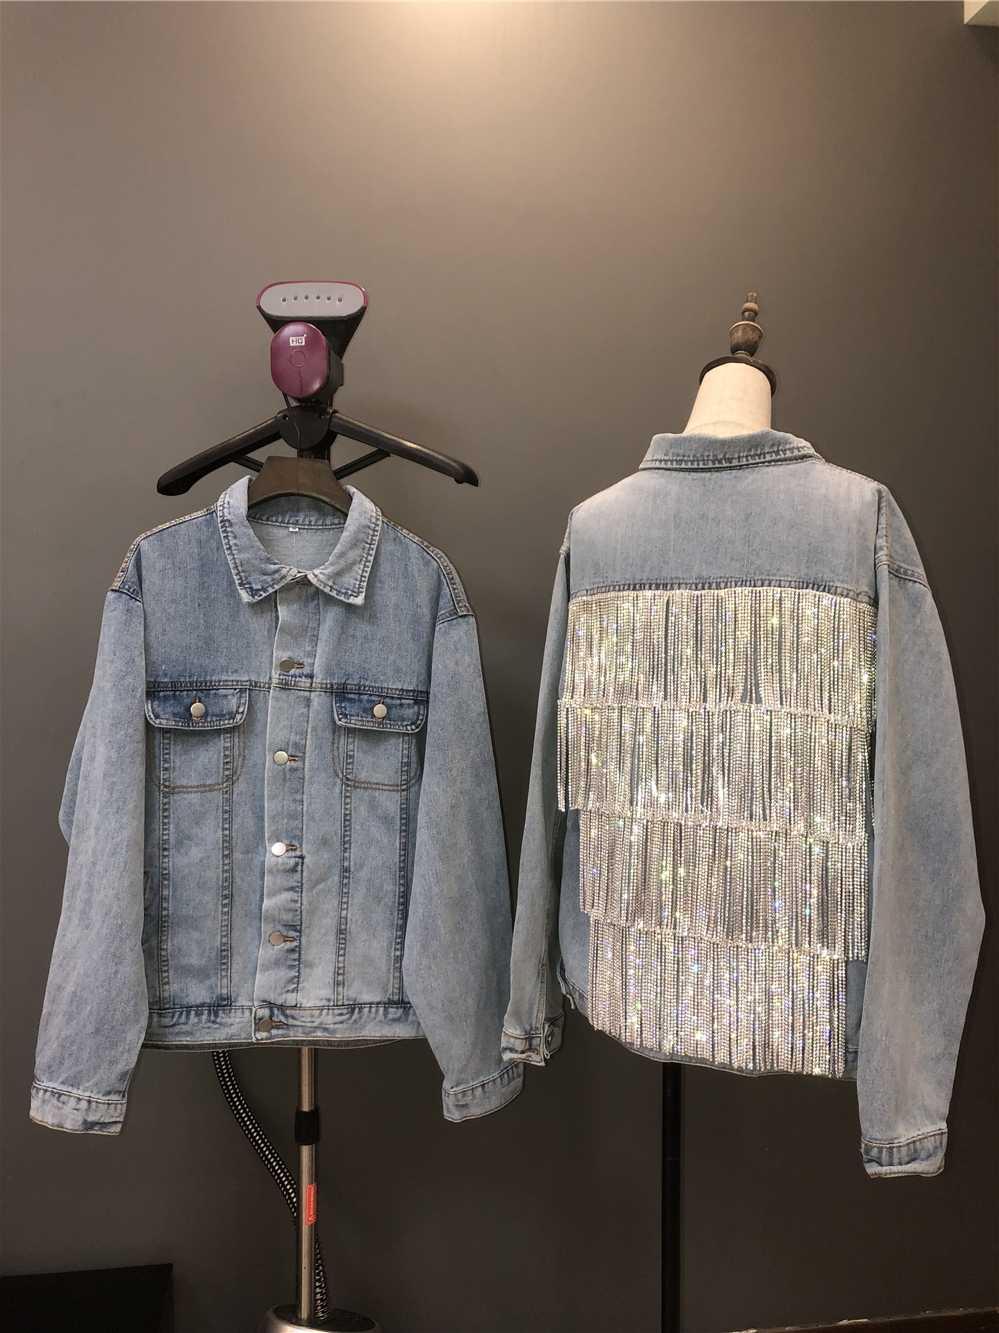 Hohe-Dichte Kette Quaste Strass Denim Jacke Frau 2020 Frühling Herbst Diamant Jean Jacke Damen Streetwear Verzierte Mantel